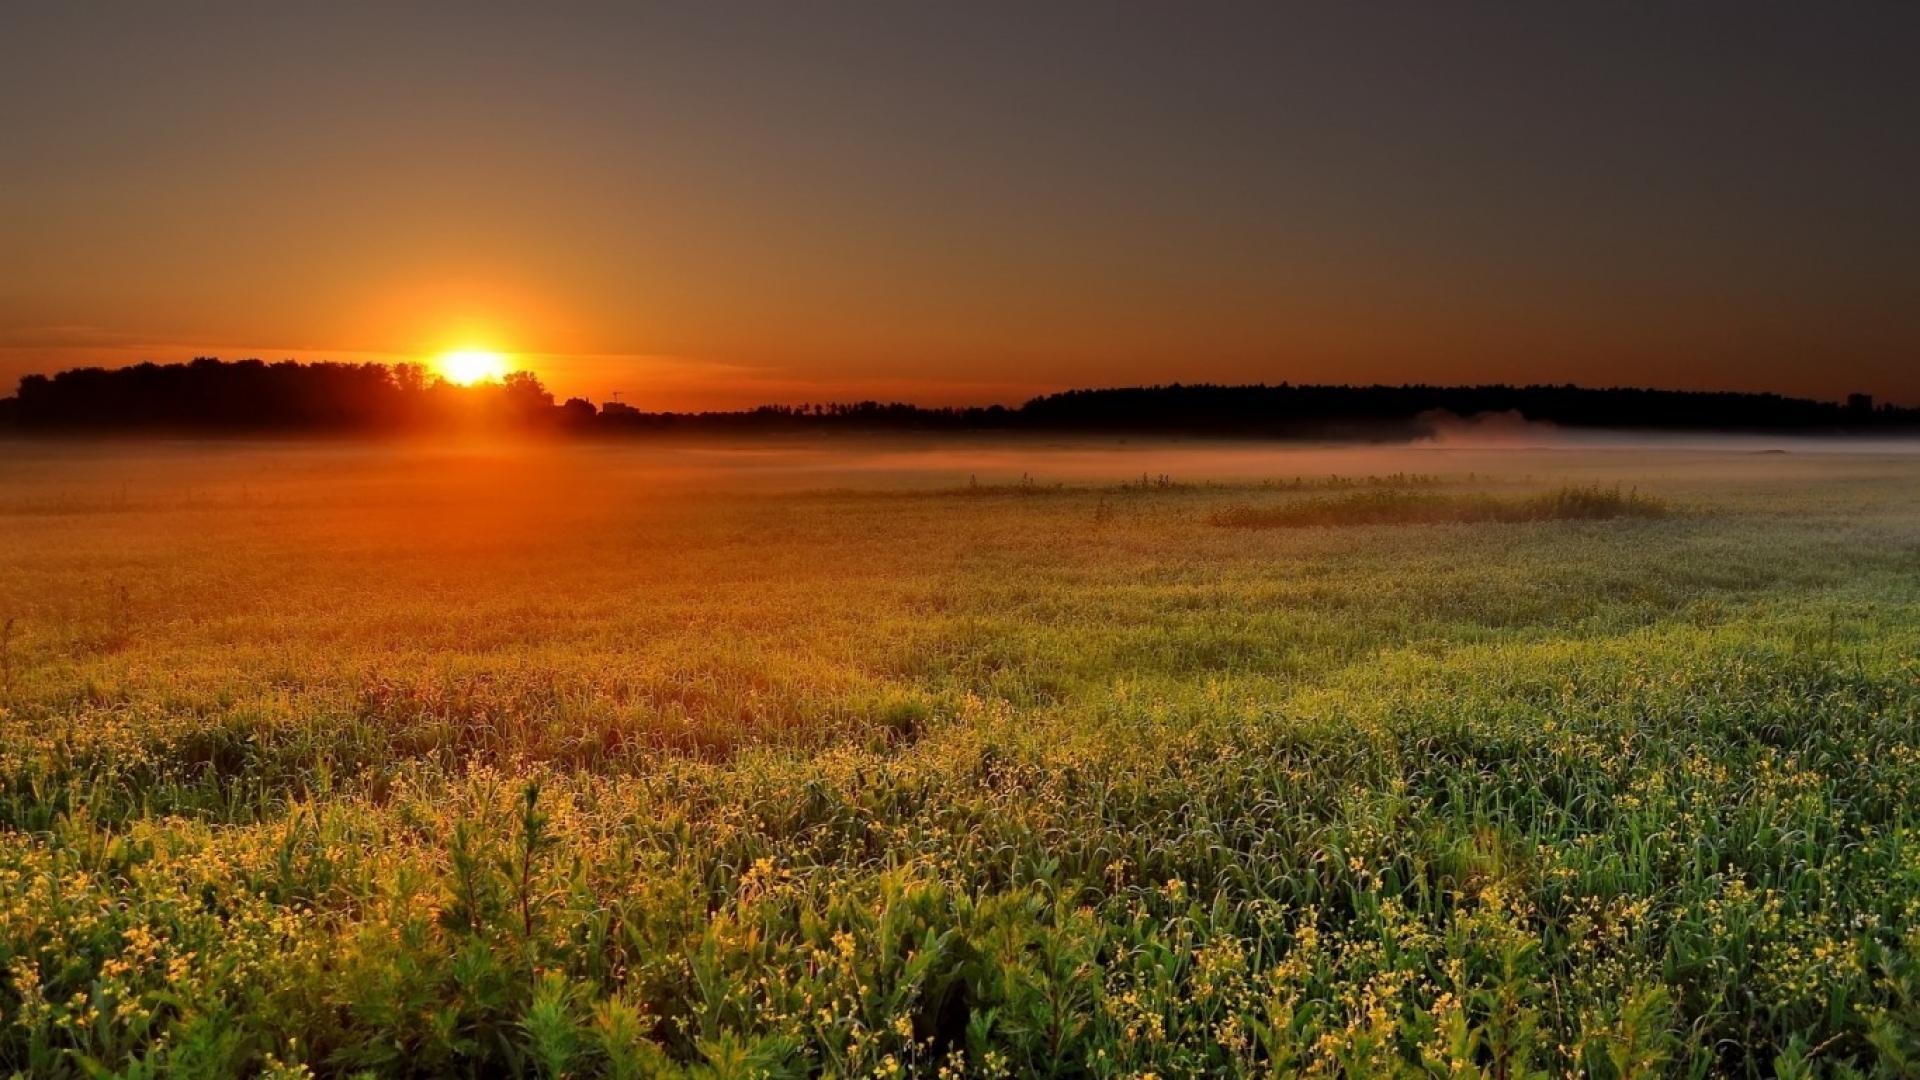 Sunset disk orange sun twilight time of day wallpaper 22109 1920x1080